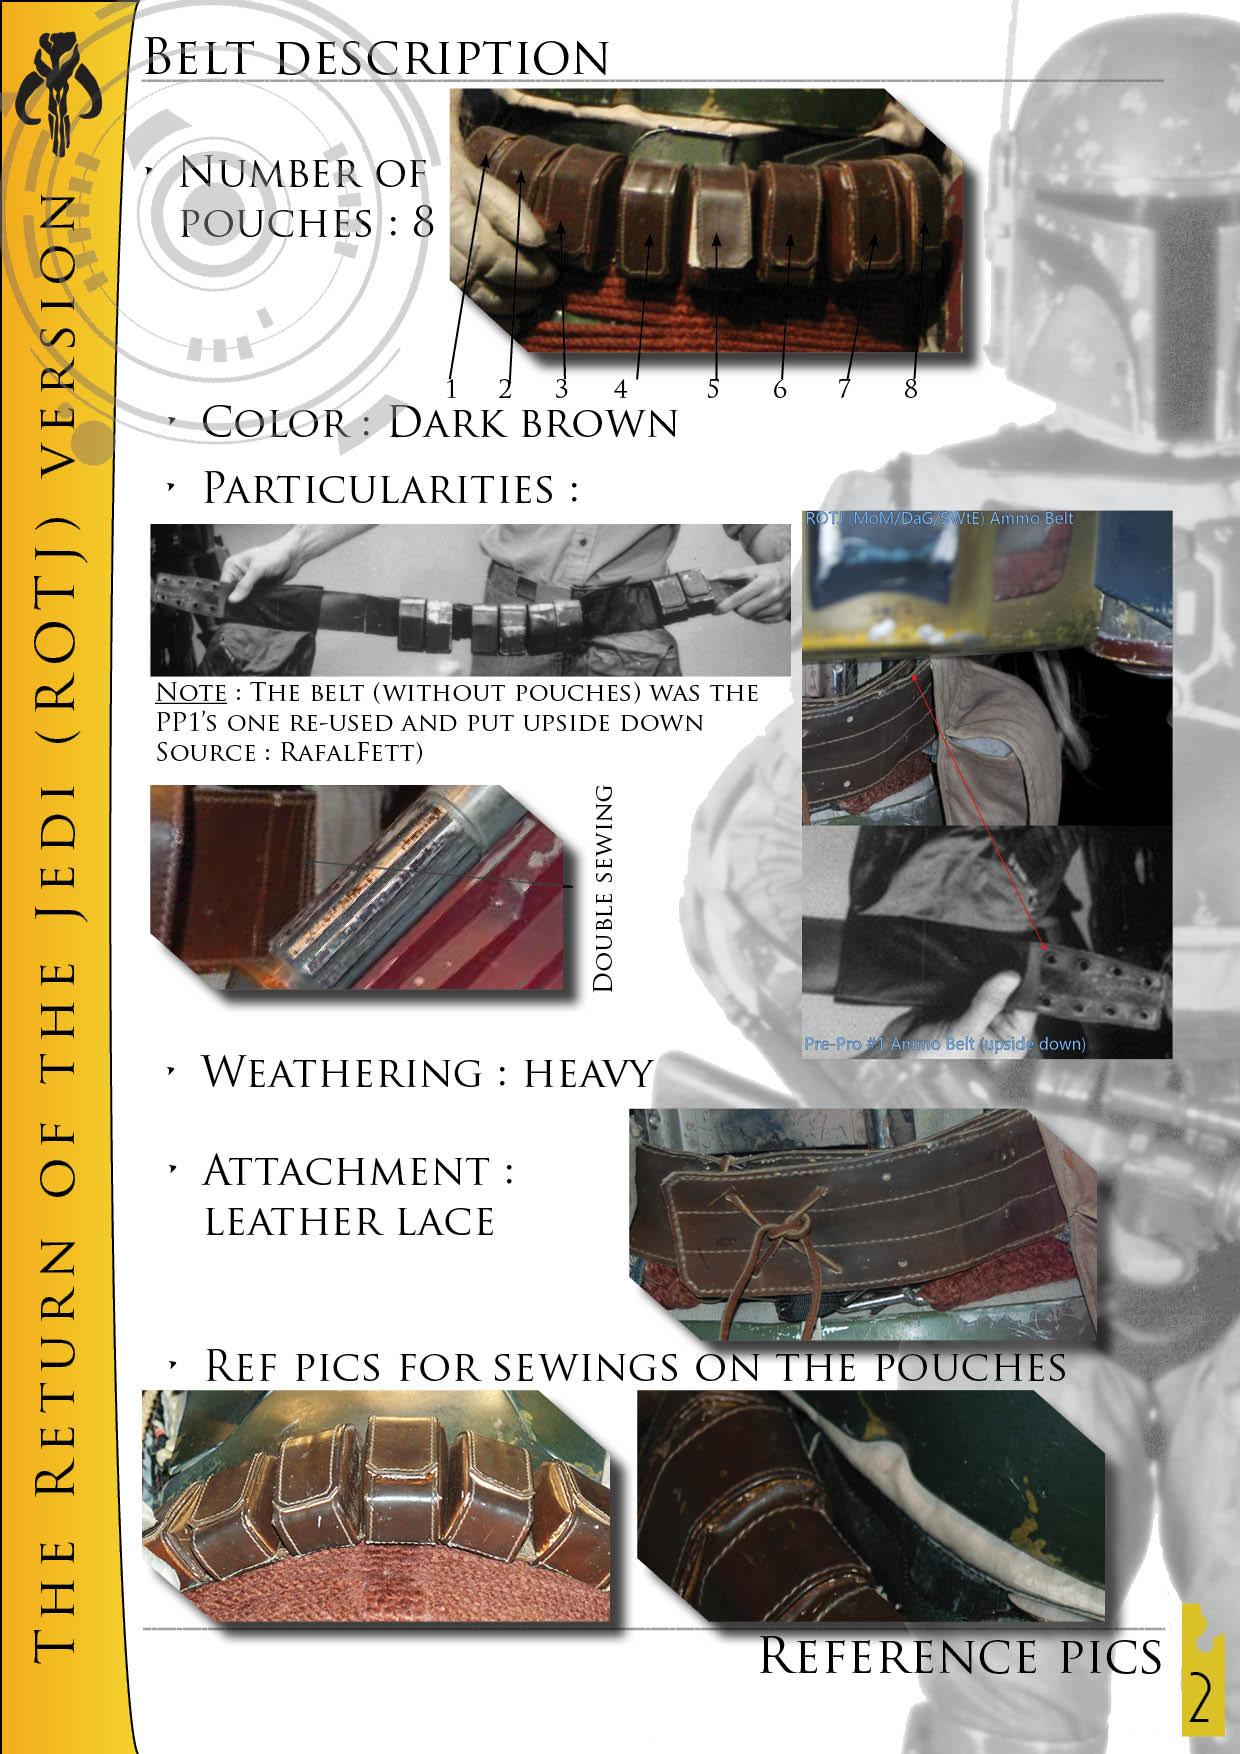 rotj-belt-description-and-ref-pics-jpg.jpg